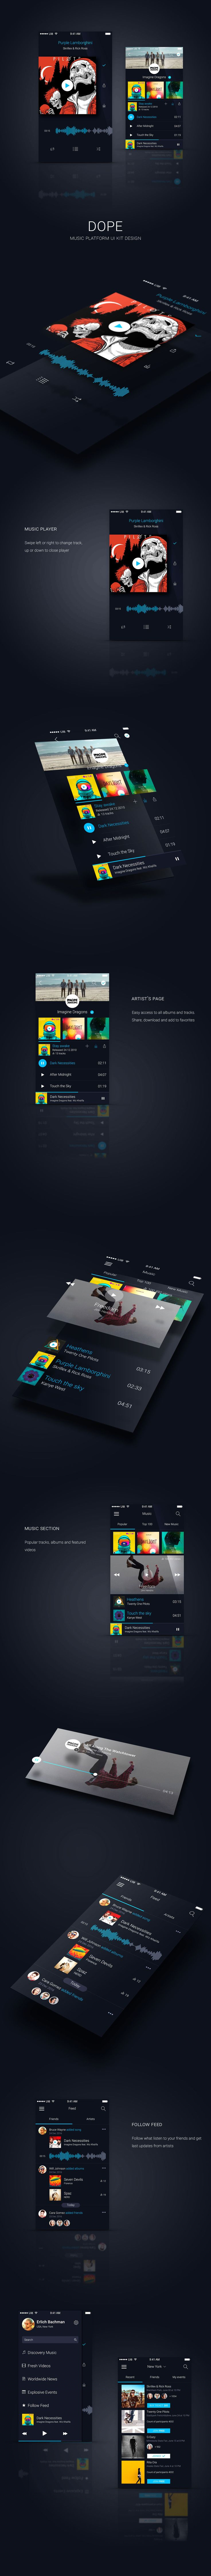 Dope - Music UI Kit App Template on Behance